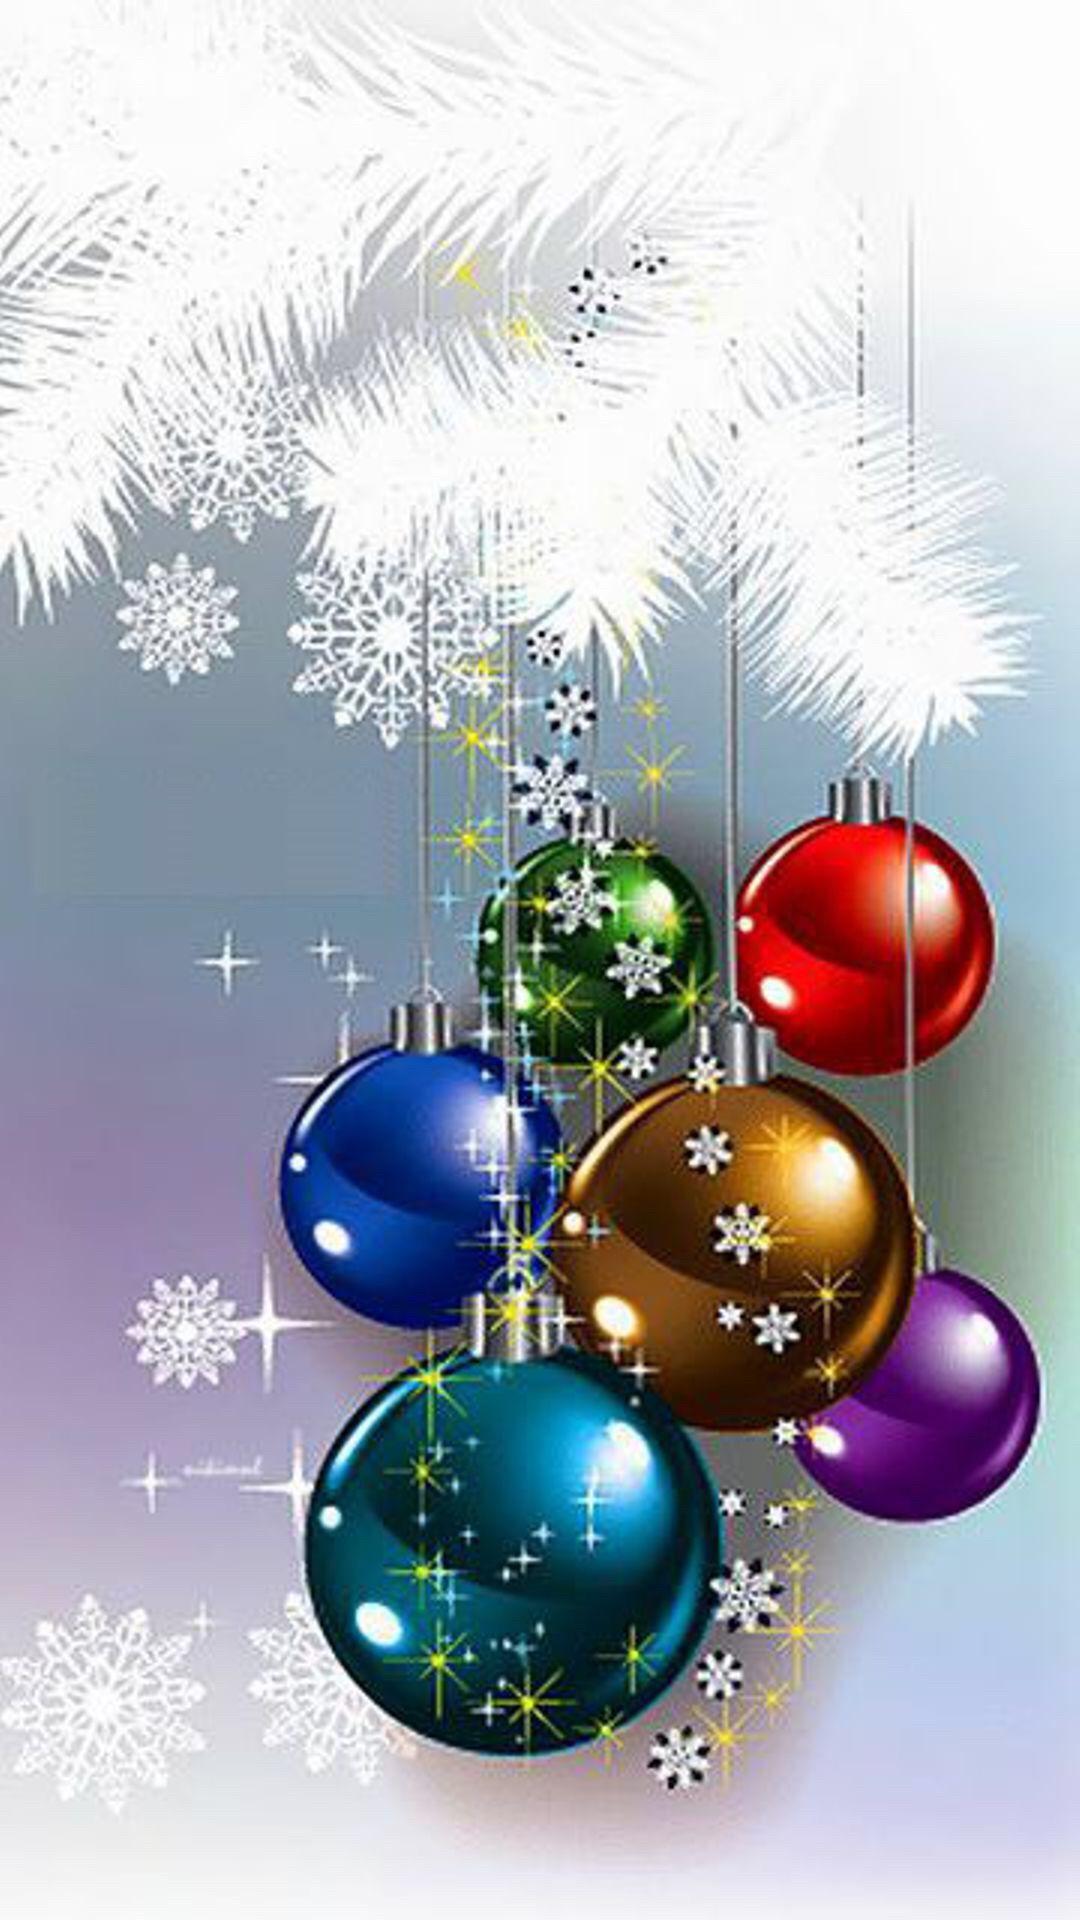 Pin by Dennis Danao on Christmassy Christmas greetings